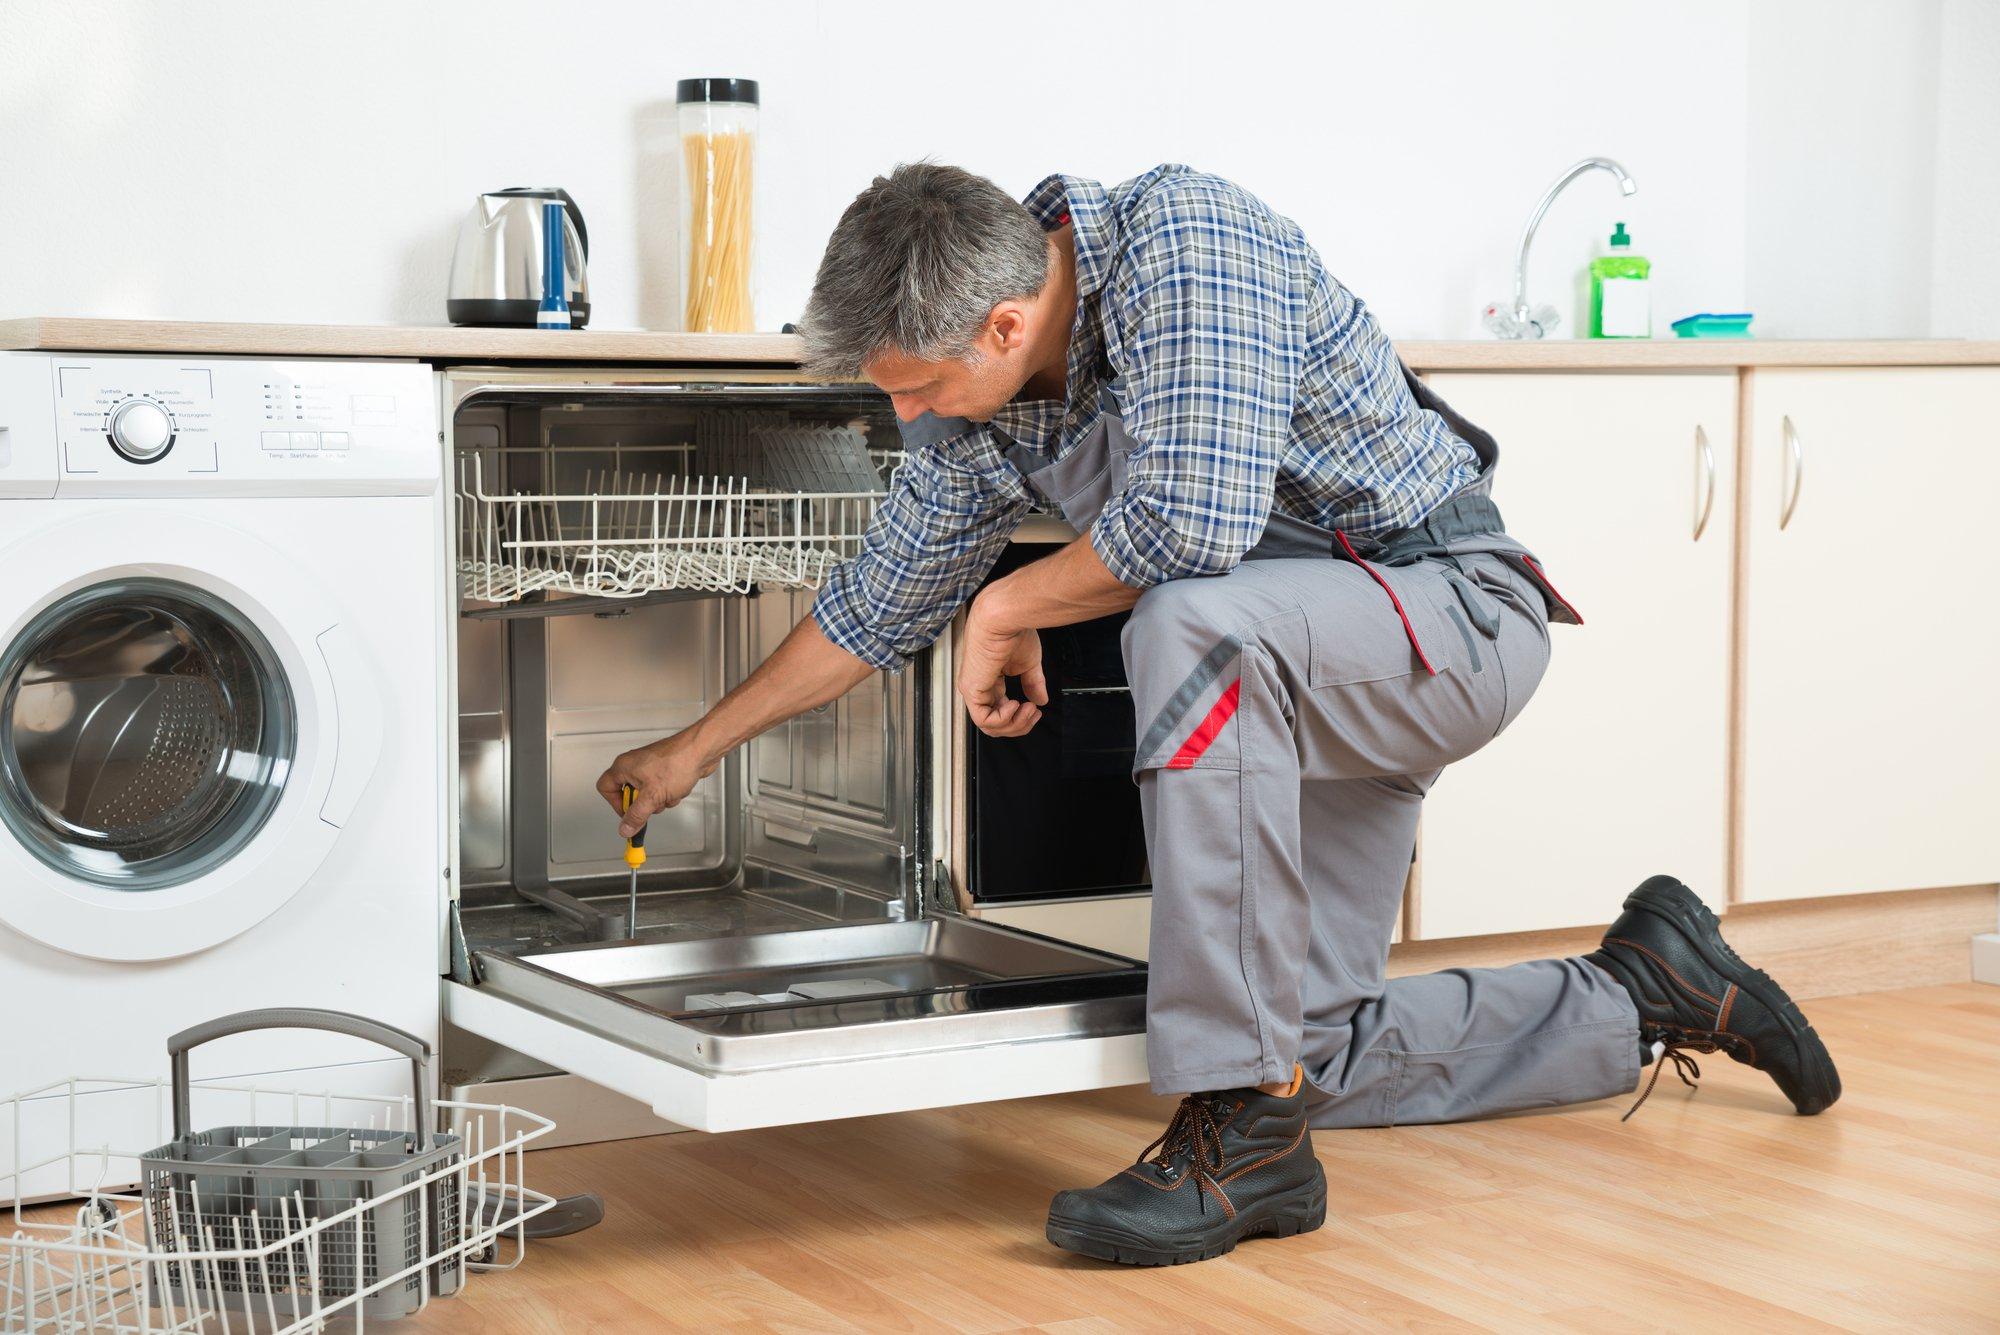 Repairman Repairing Dishwasher With Screwdriver In Kitchen